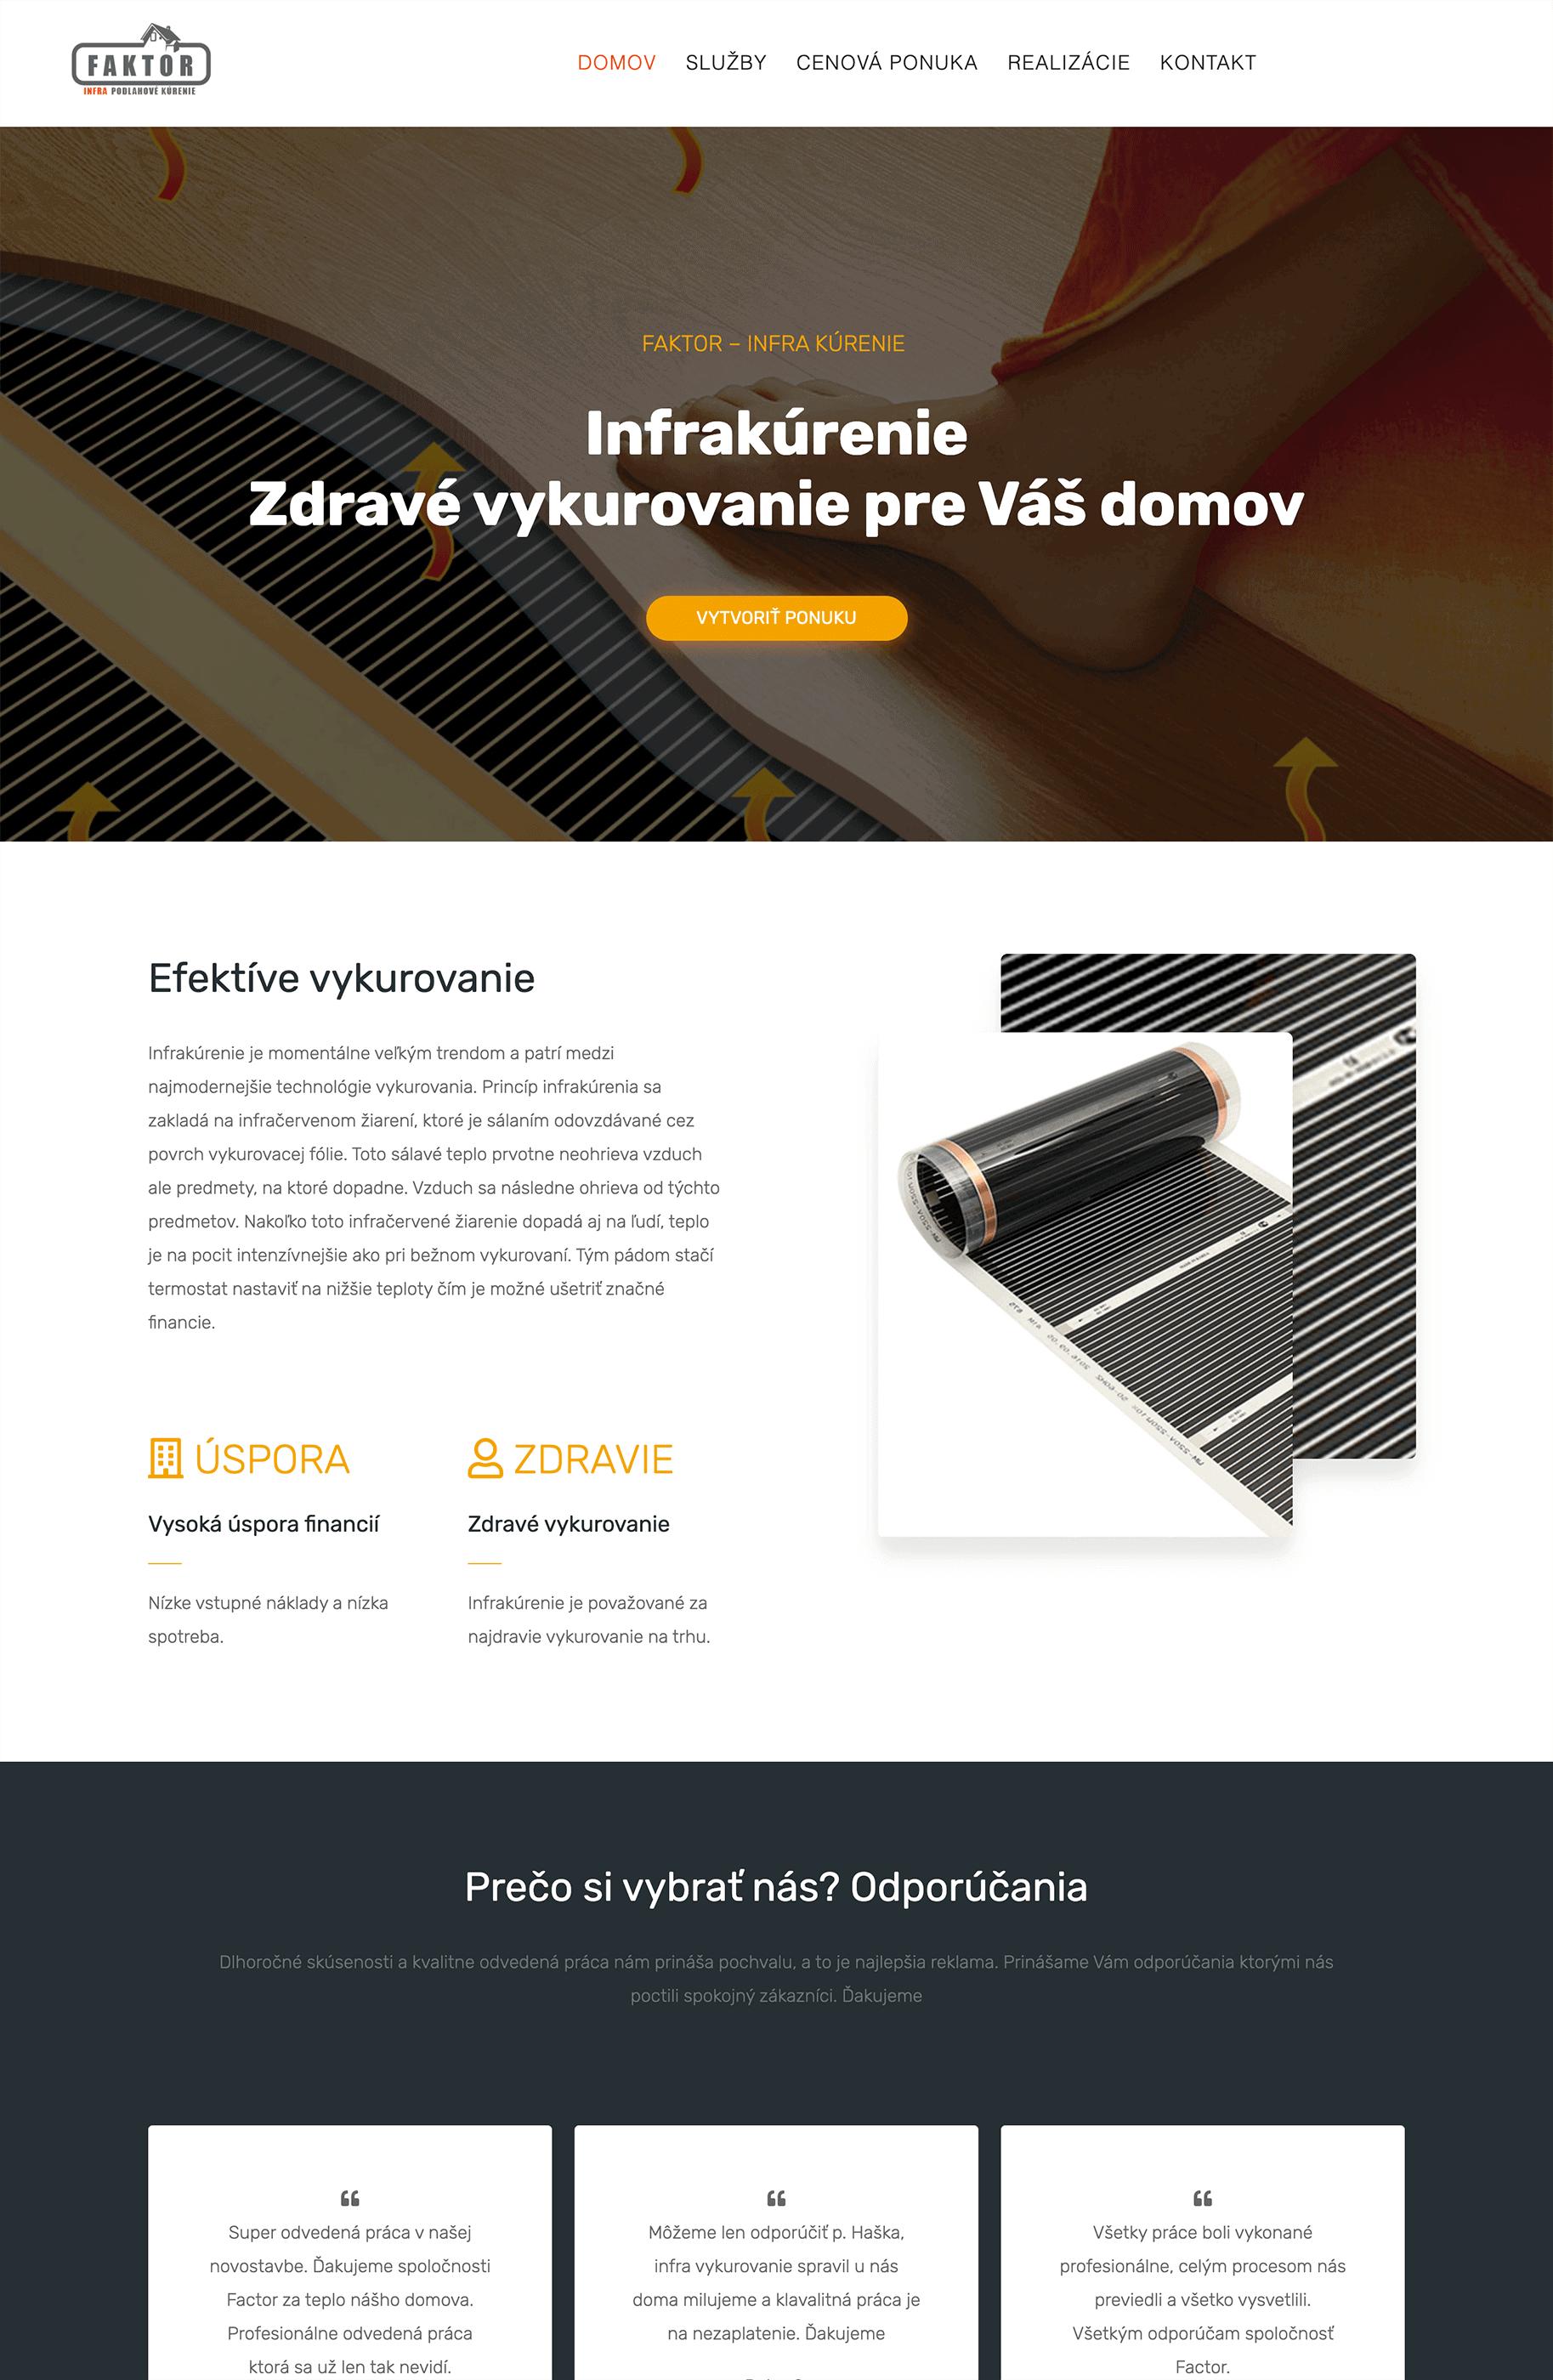 web design infrakurenie